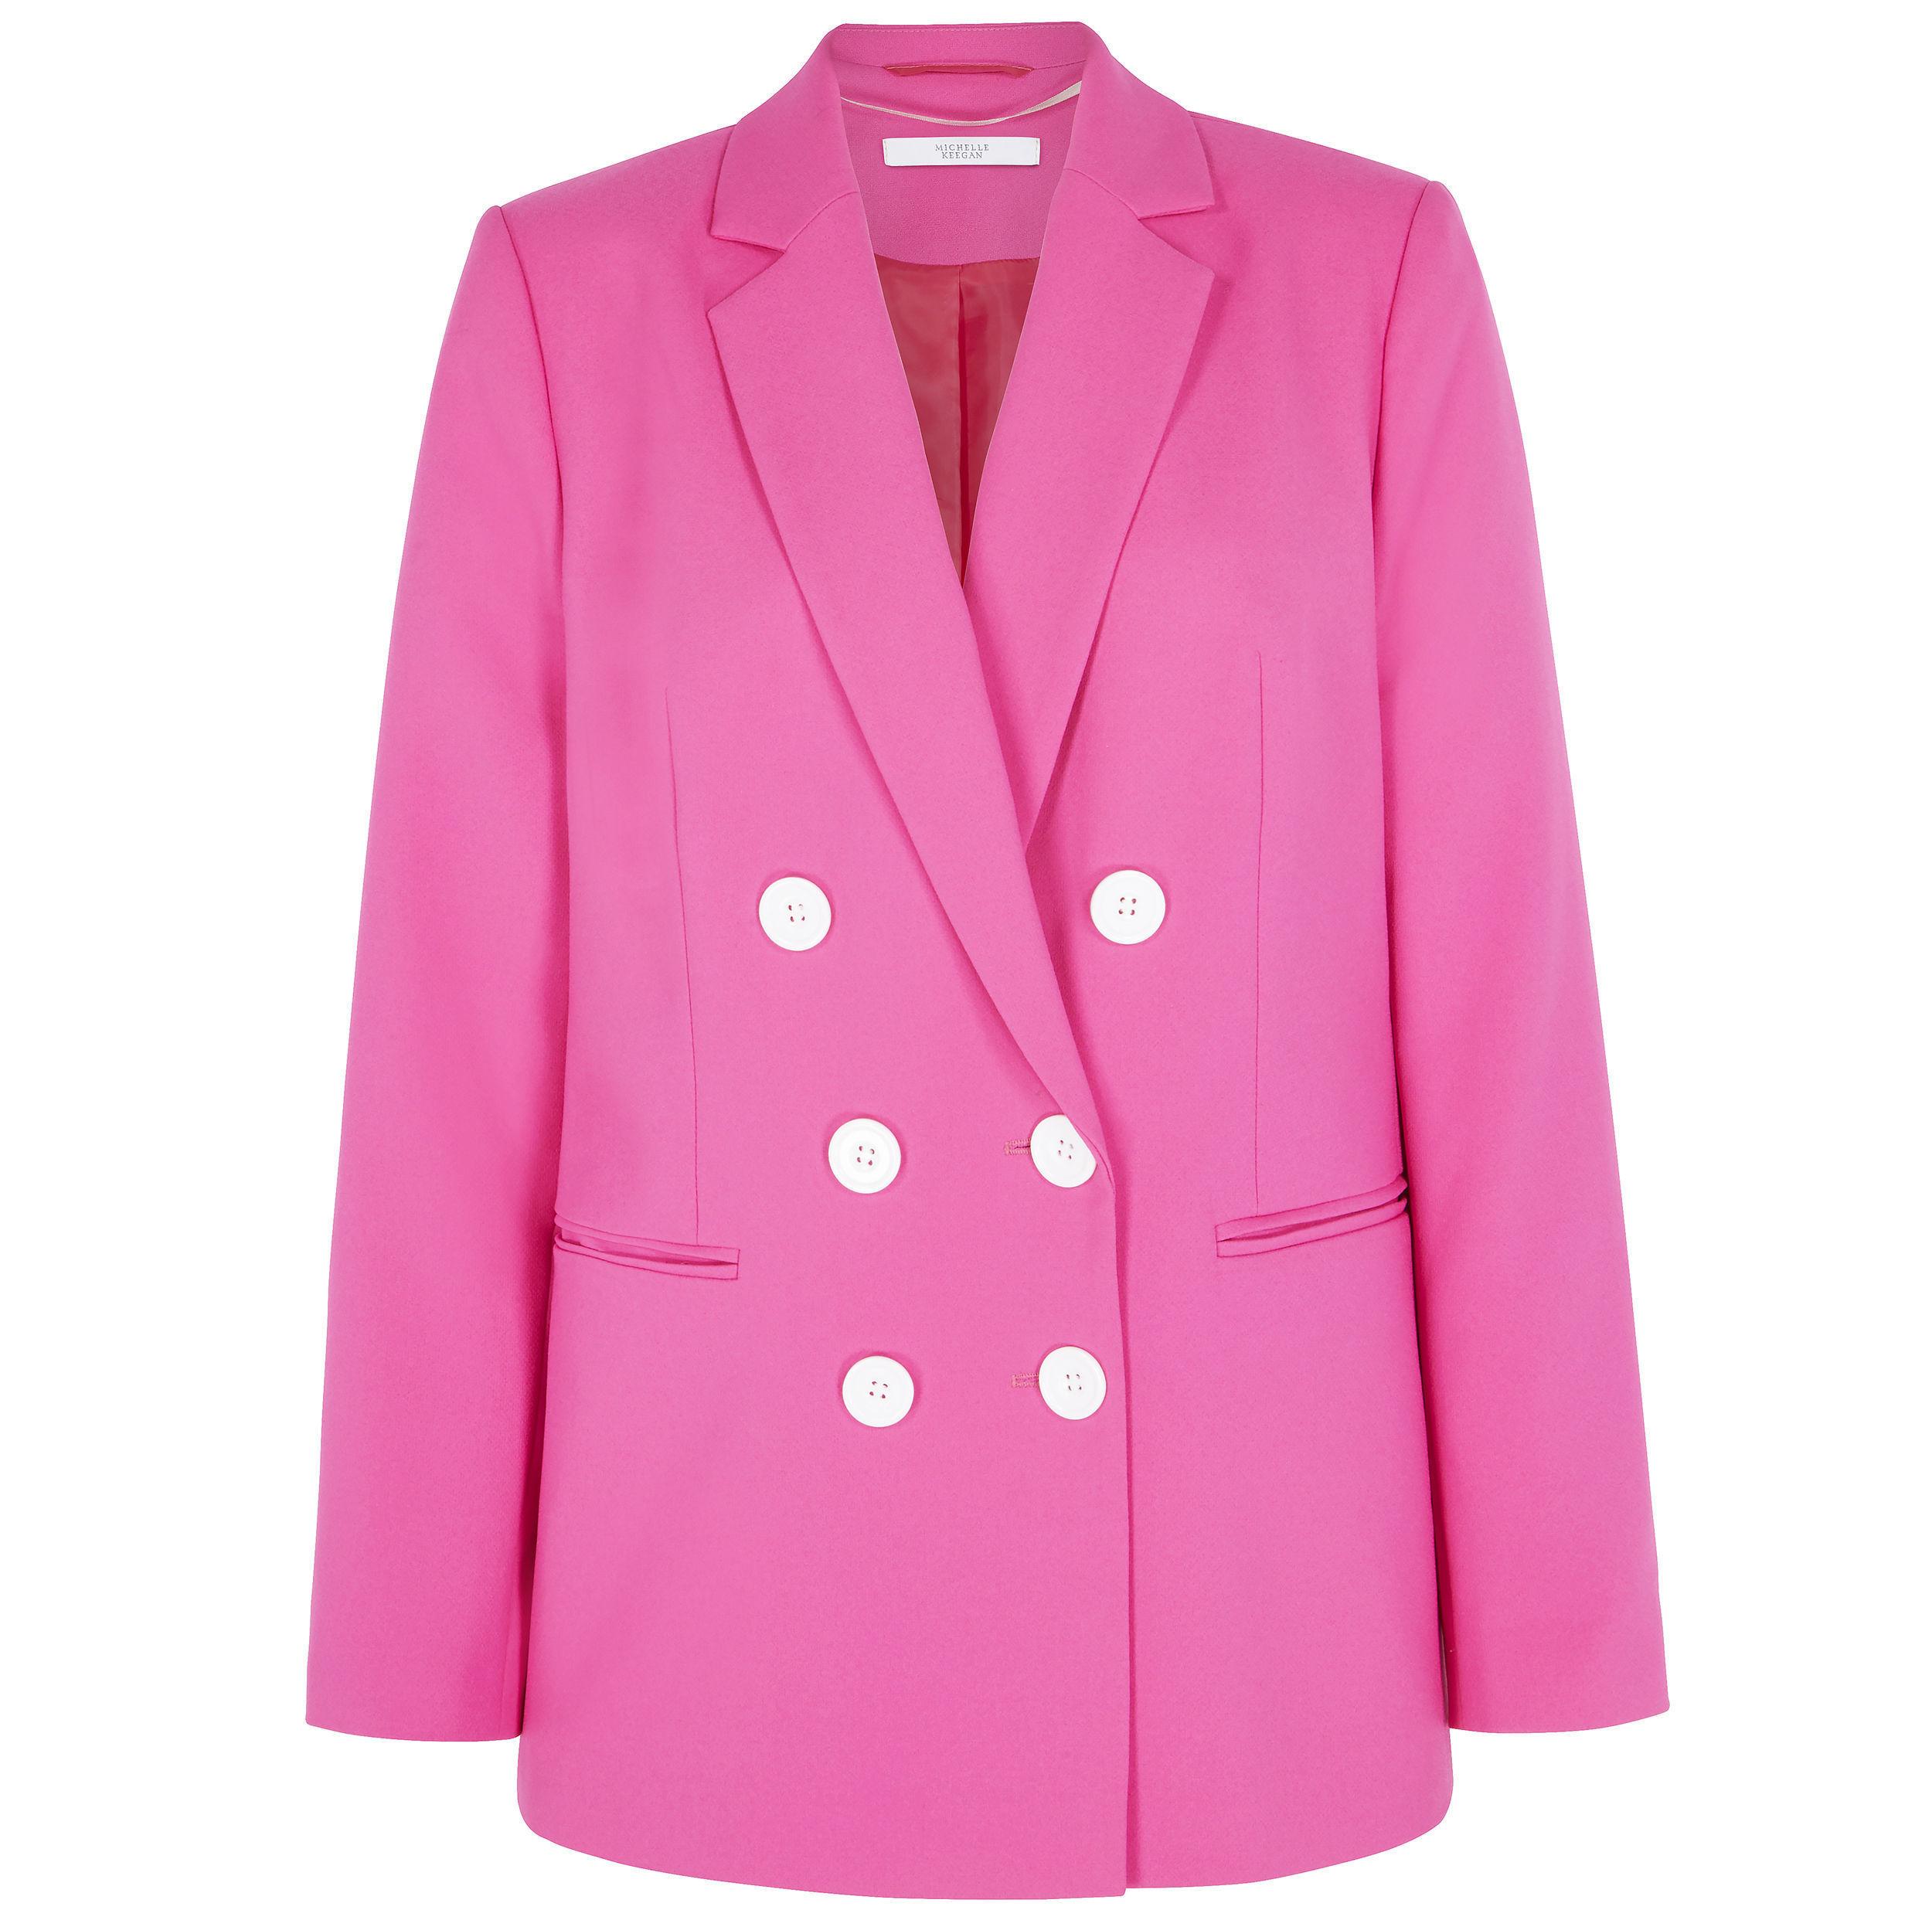 2. Very Michelle Keegan Oversized Double Breasted Blazer - Fuchsia, £60